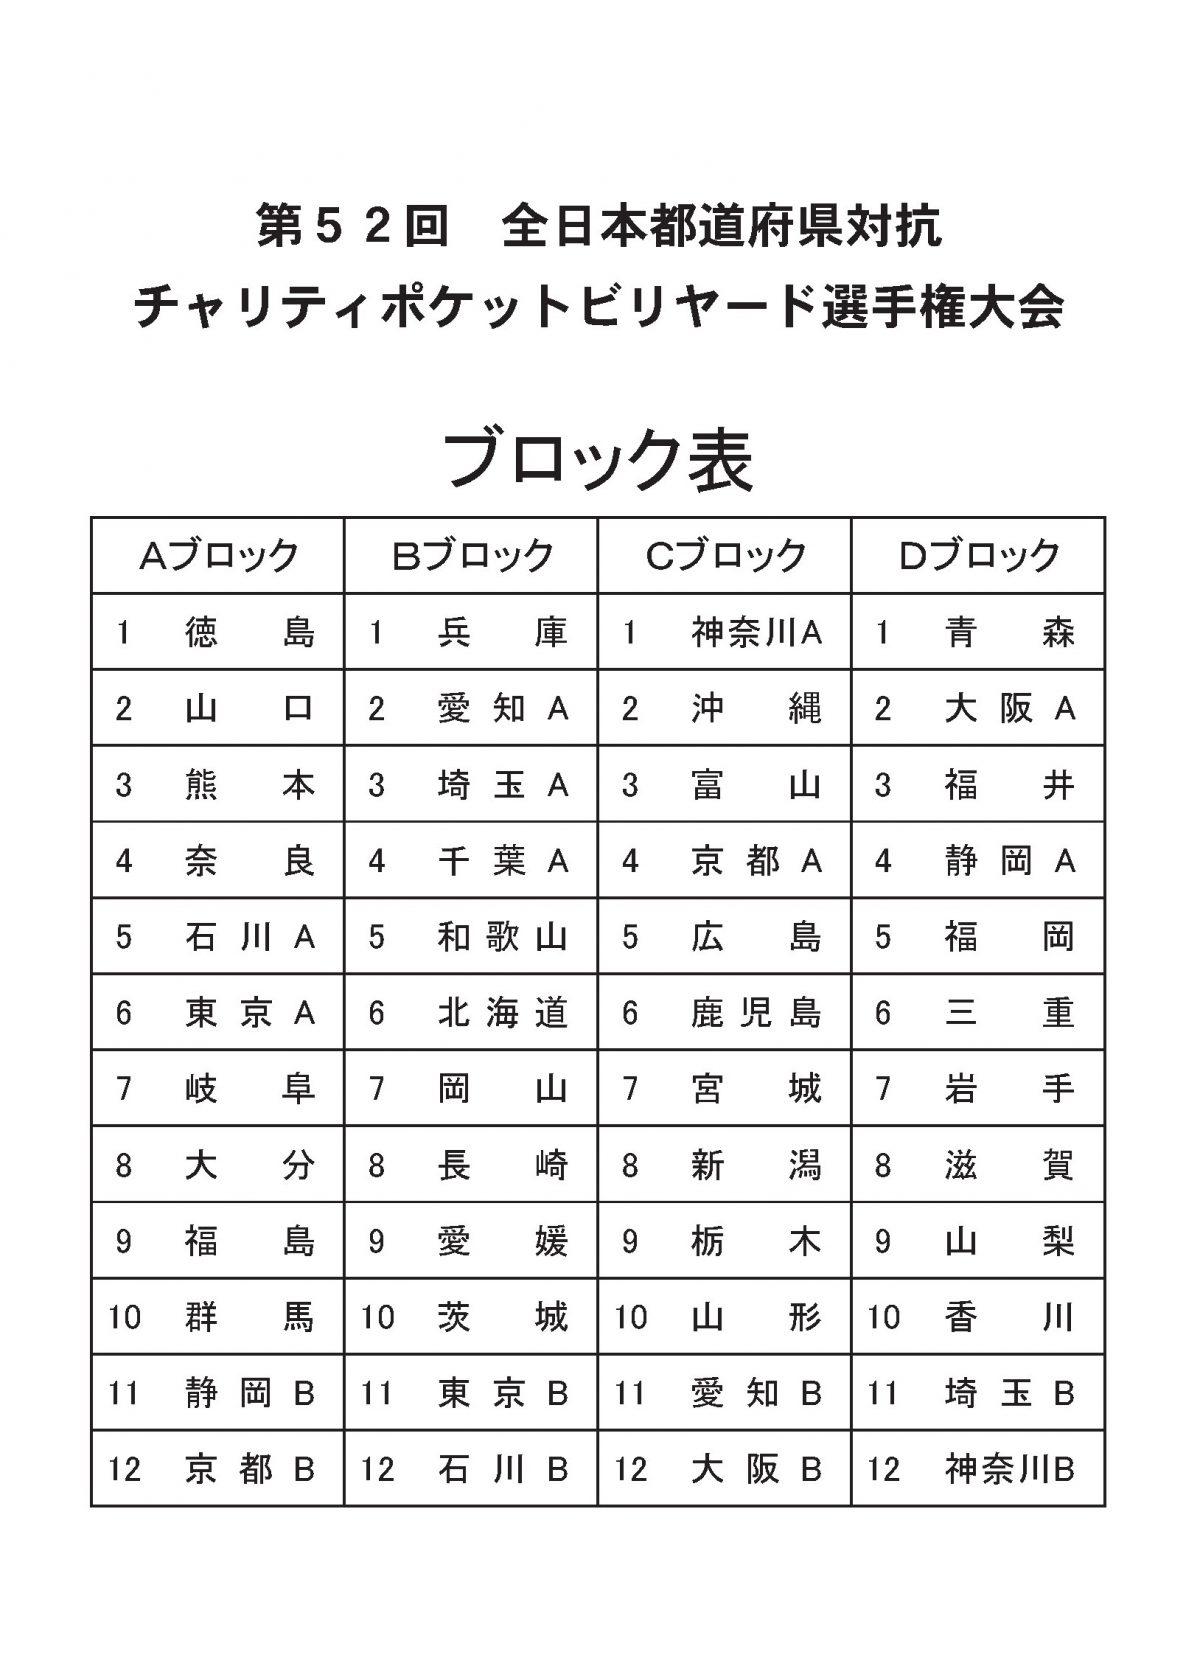 都道府県対抗ブロック表